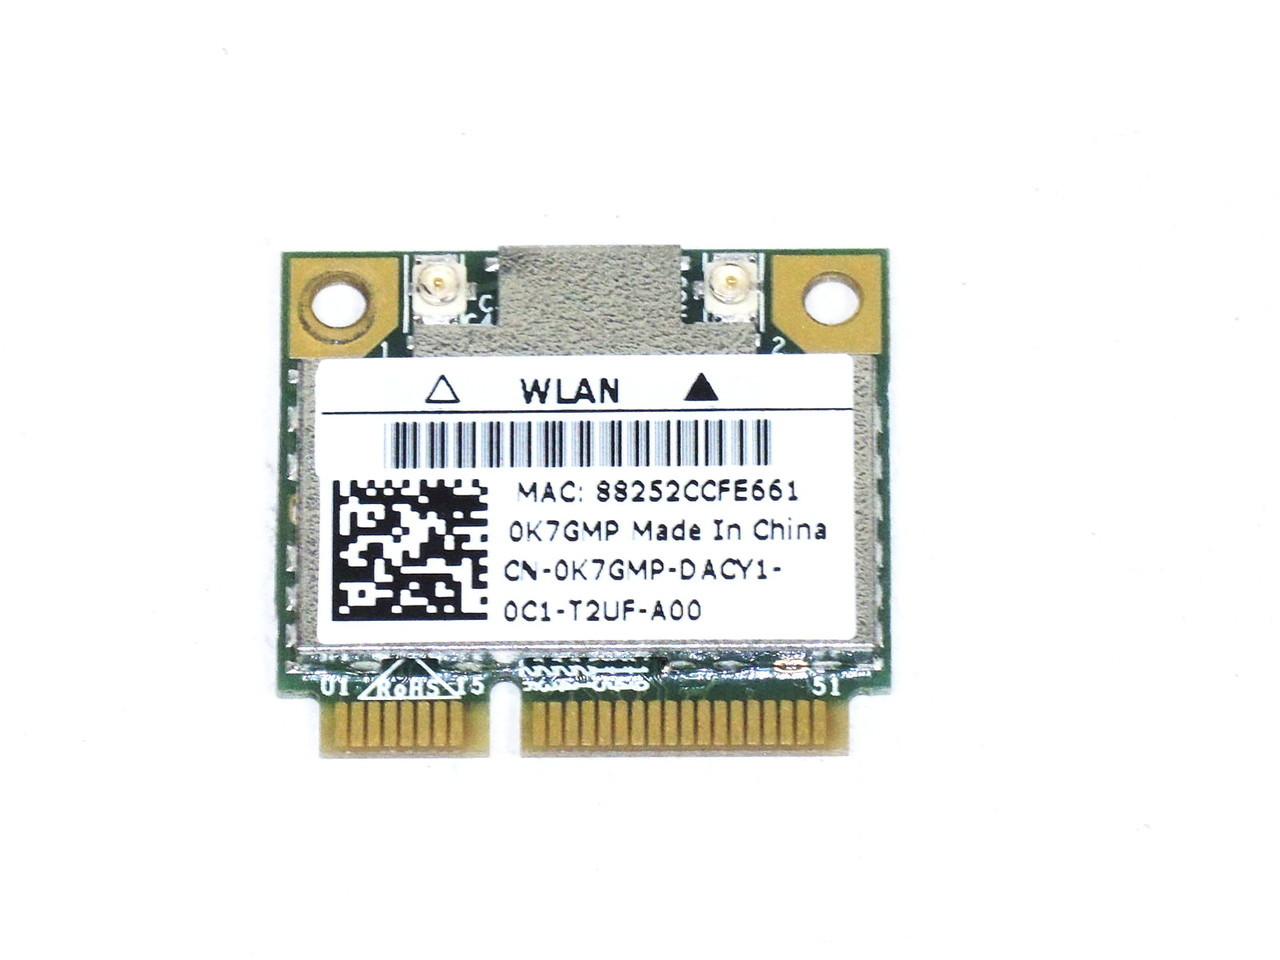 Dell Inspiron 1018 Realtek 8188CE Wireless WLAN WiFi 802.11 a/b/g/n Half-Height Mini-PCI Express Card - K7GMP